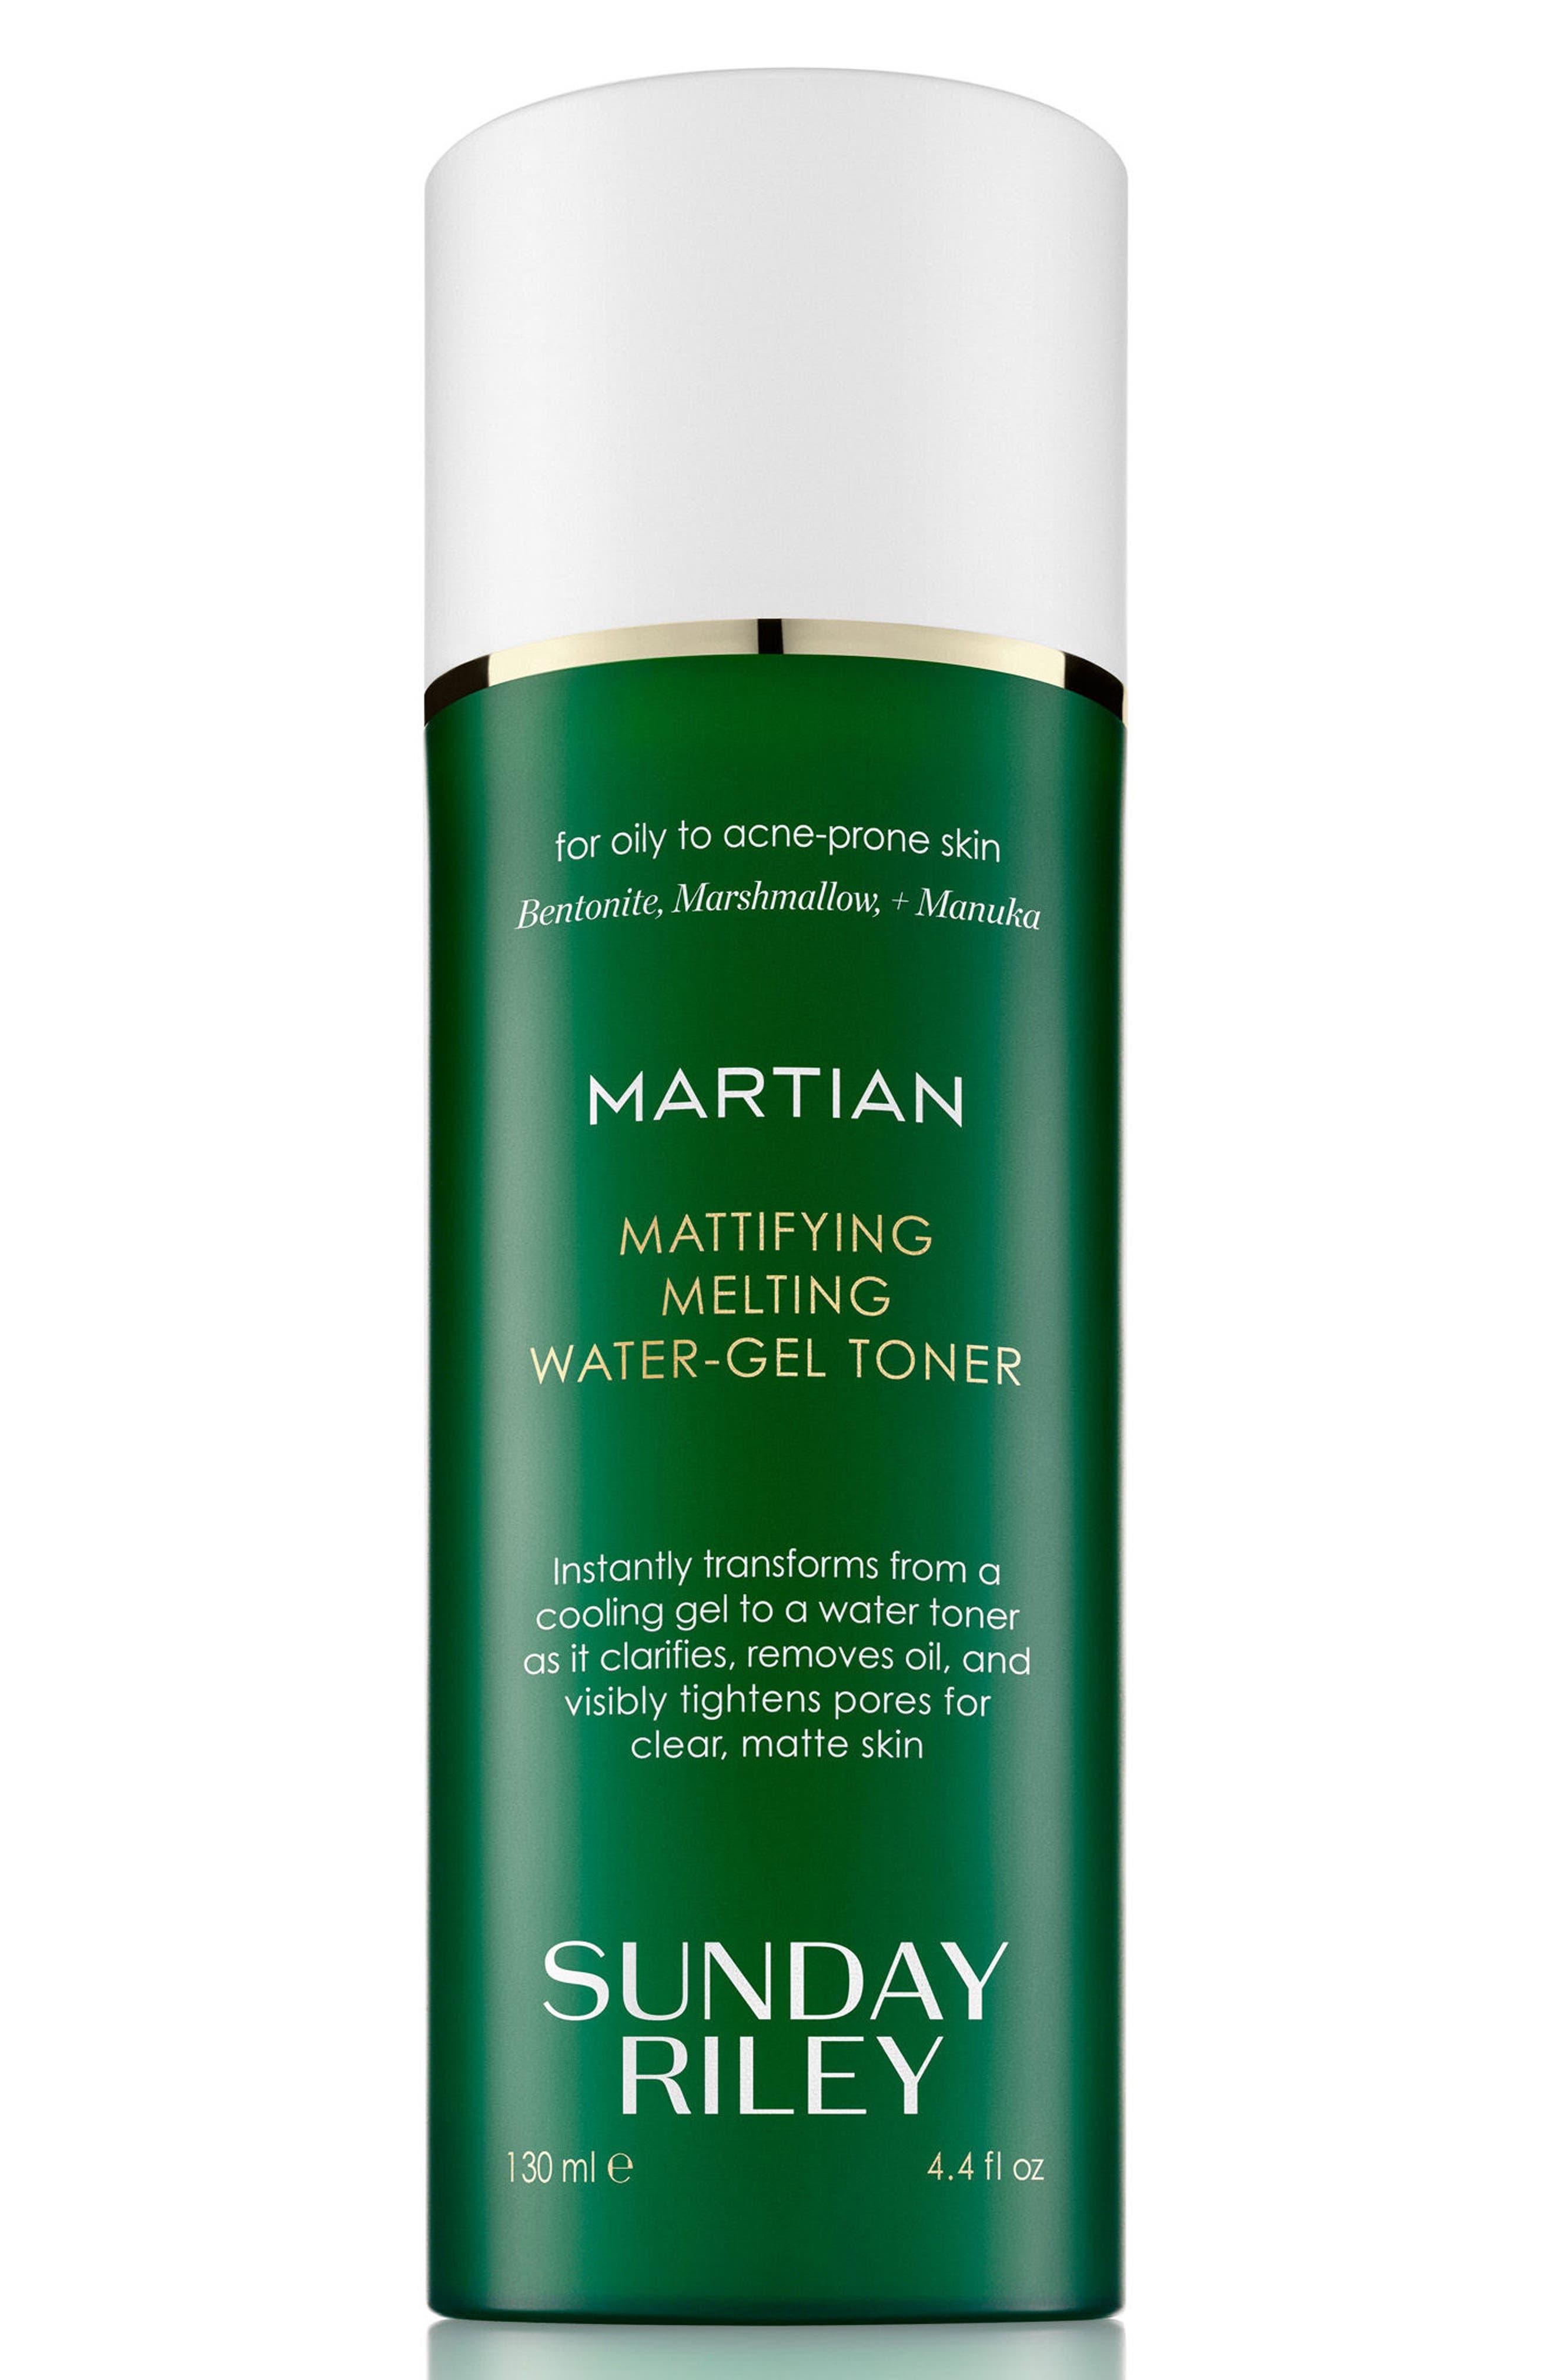 Alternate Image 1 Selected - SPACE.NK.apothecary Sunday Riley Martian Mattifying Melting Water-Gel Toner